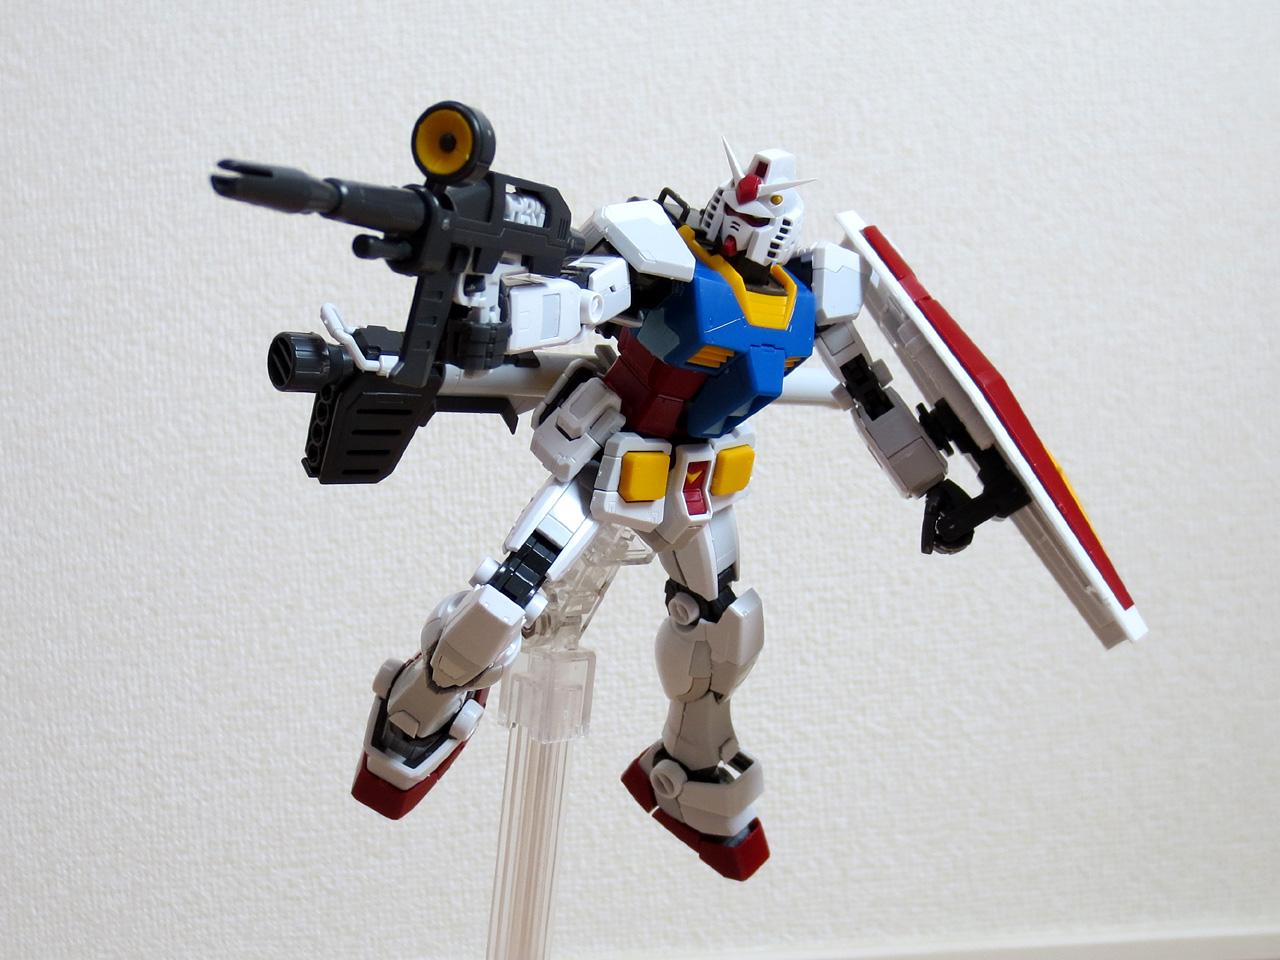 RG_RX78_2_Gundam_28.jpg